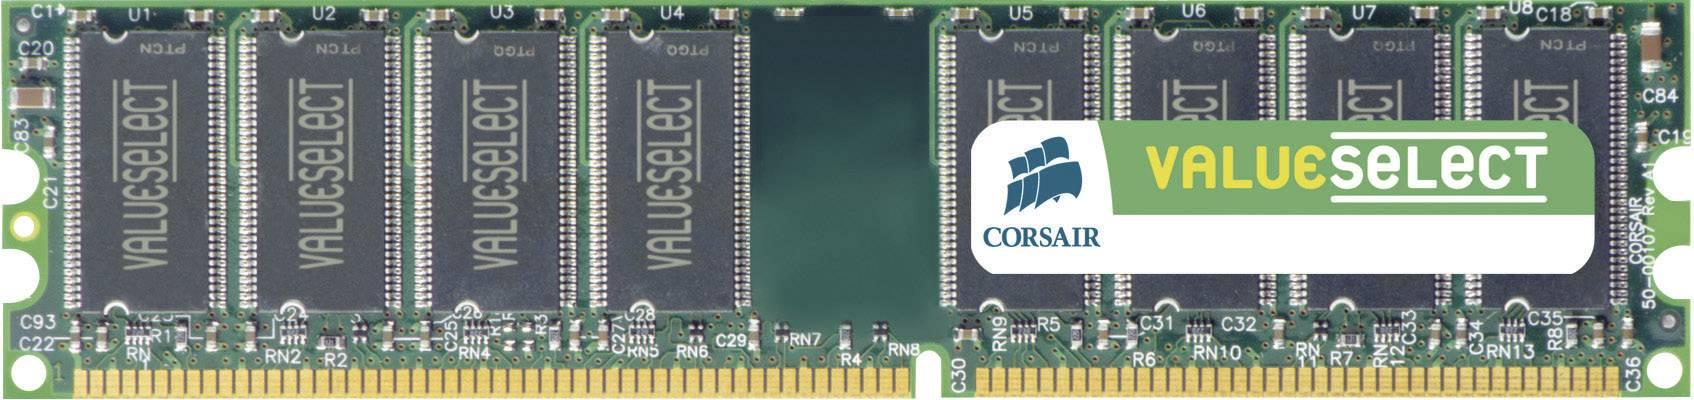 Operační paměť do PC Corsair, VS512MB400, DDR-RAM, 400 MHz, 512 MB